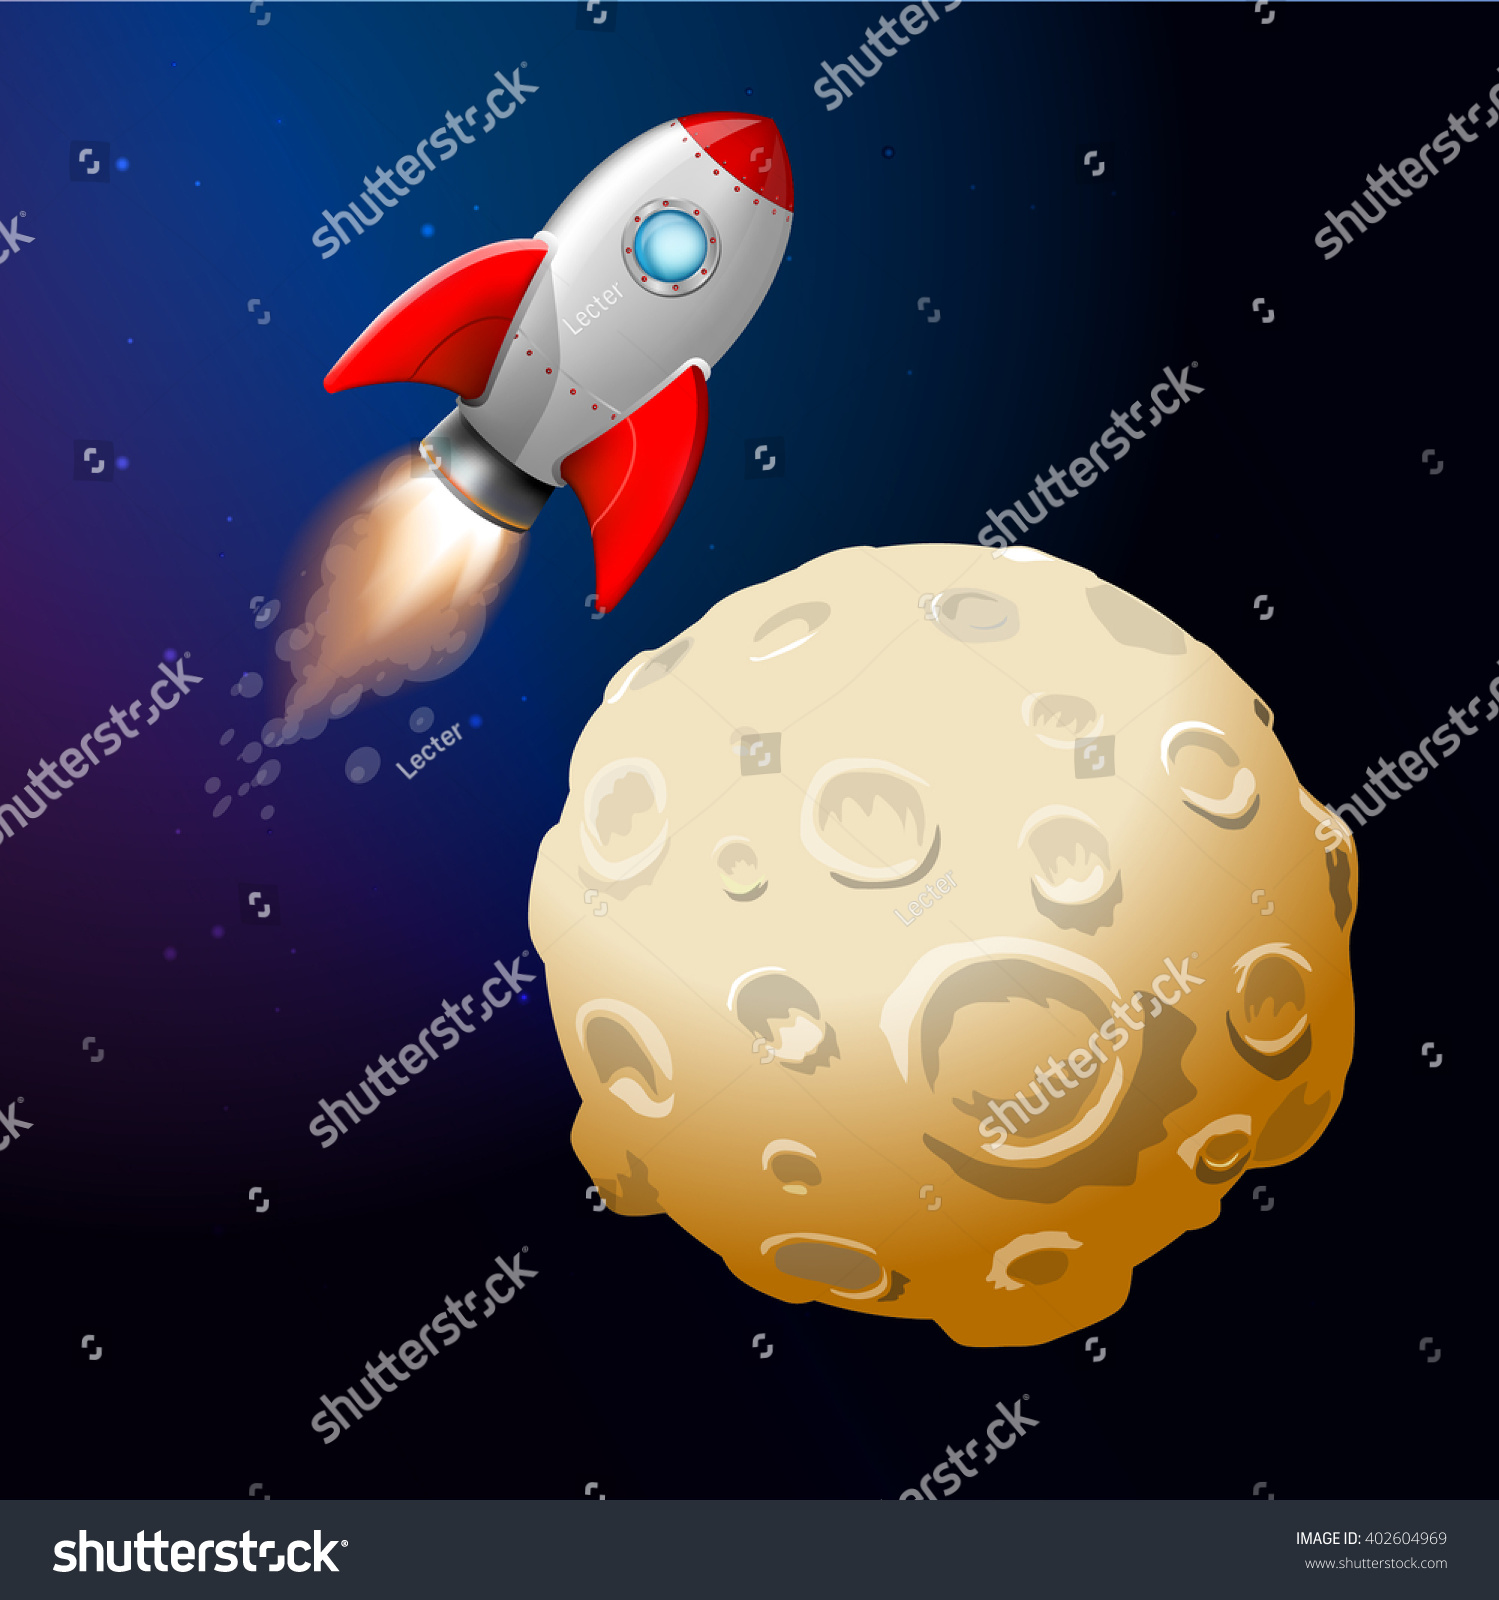 Rockets To The Moon: Rocket Fly Moon Rocket Moon Cartoon Stock Vector 402604969